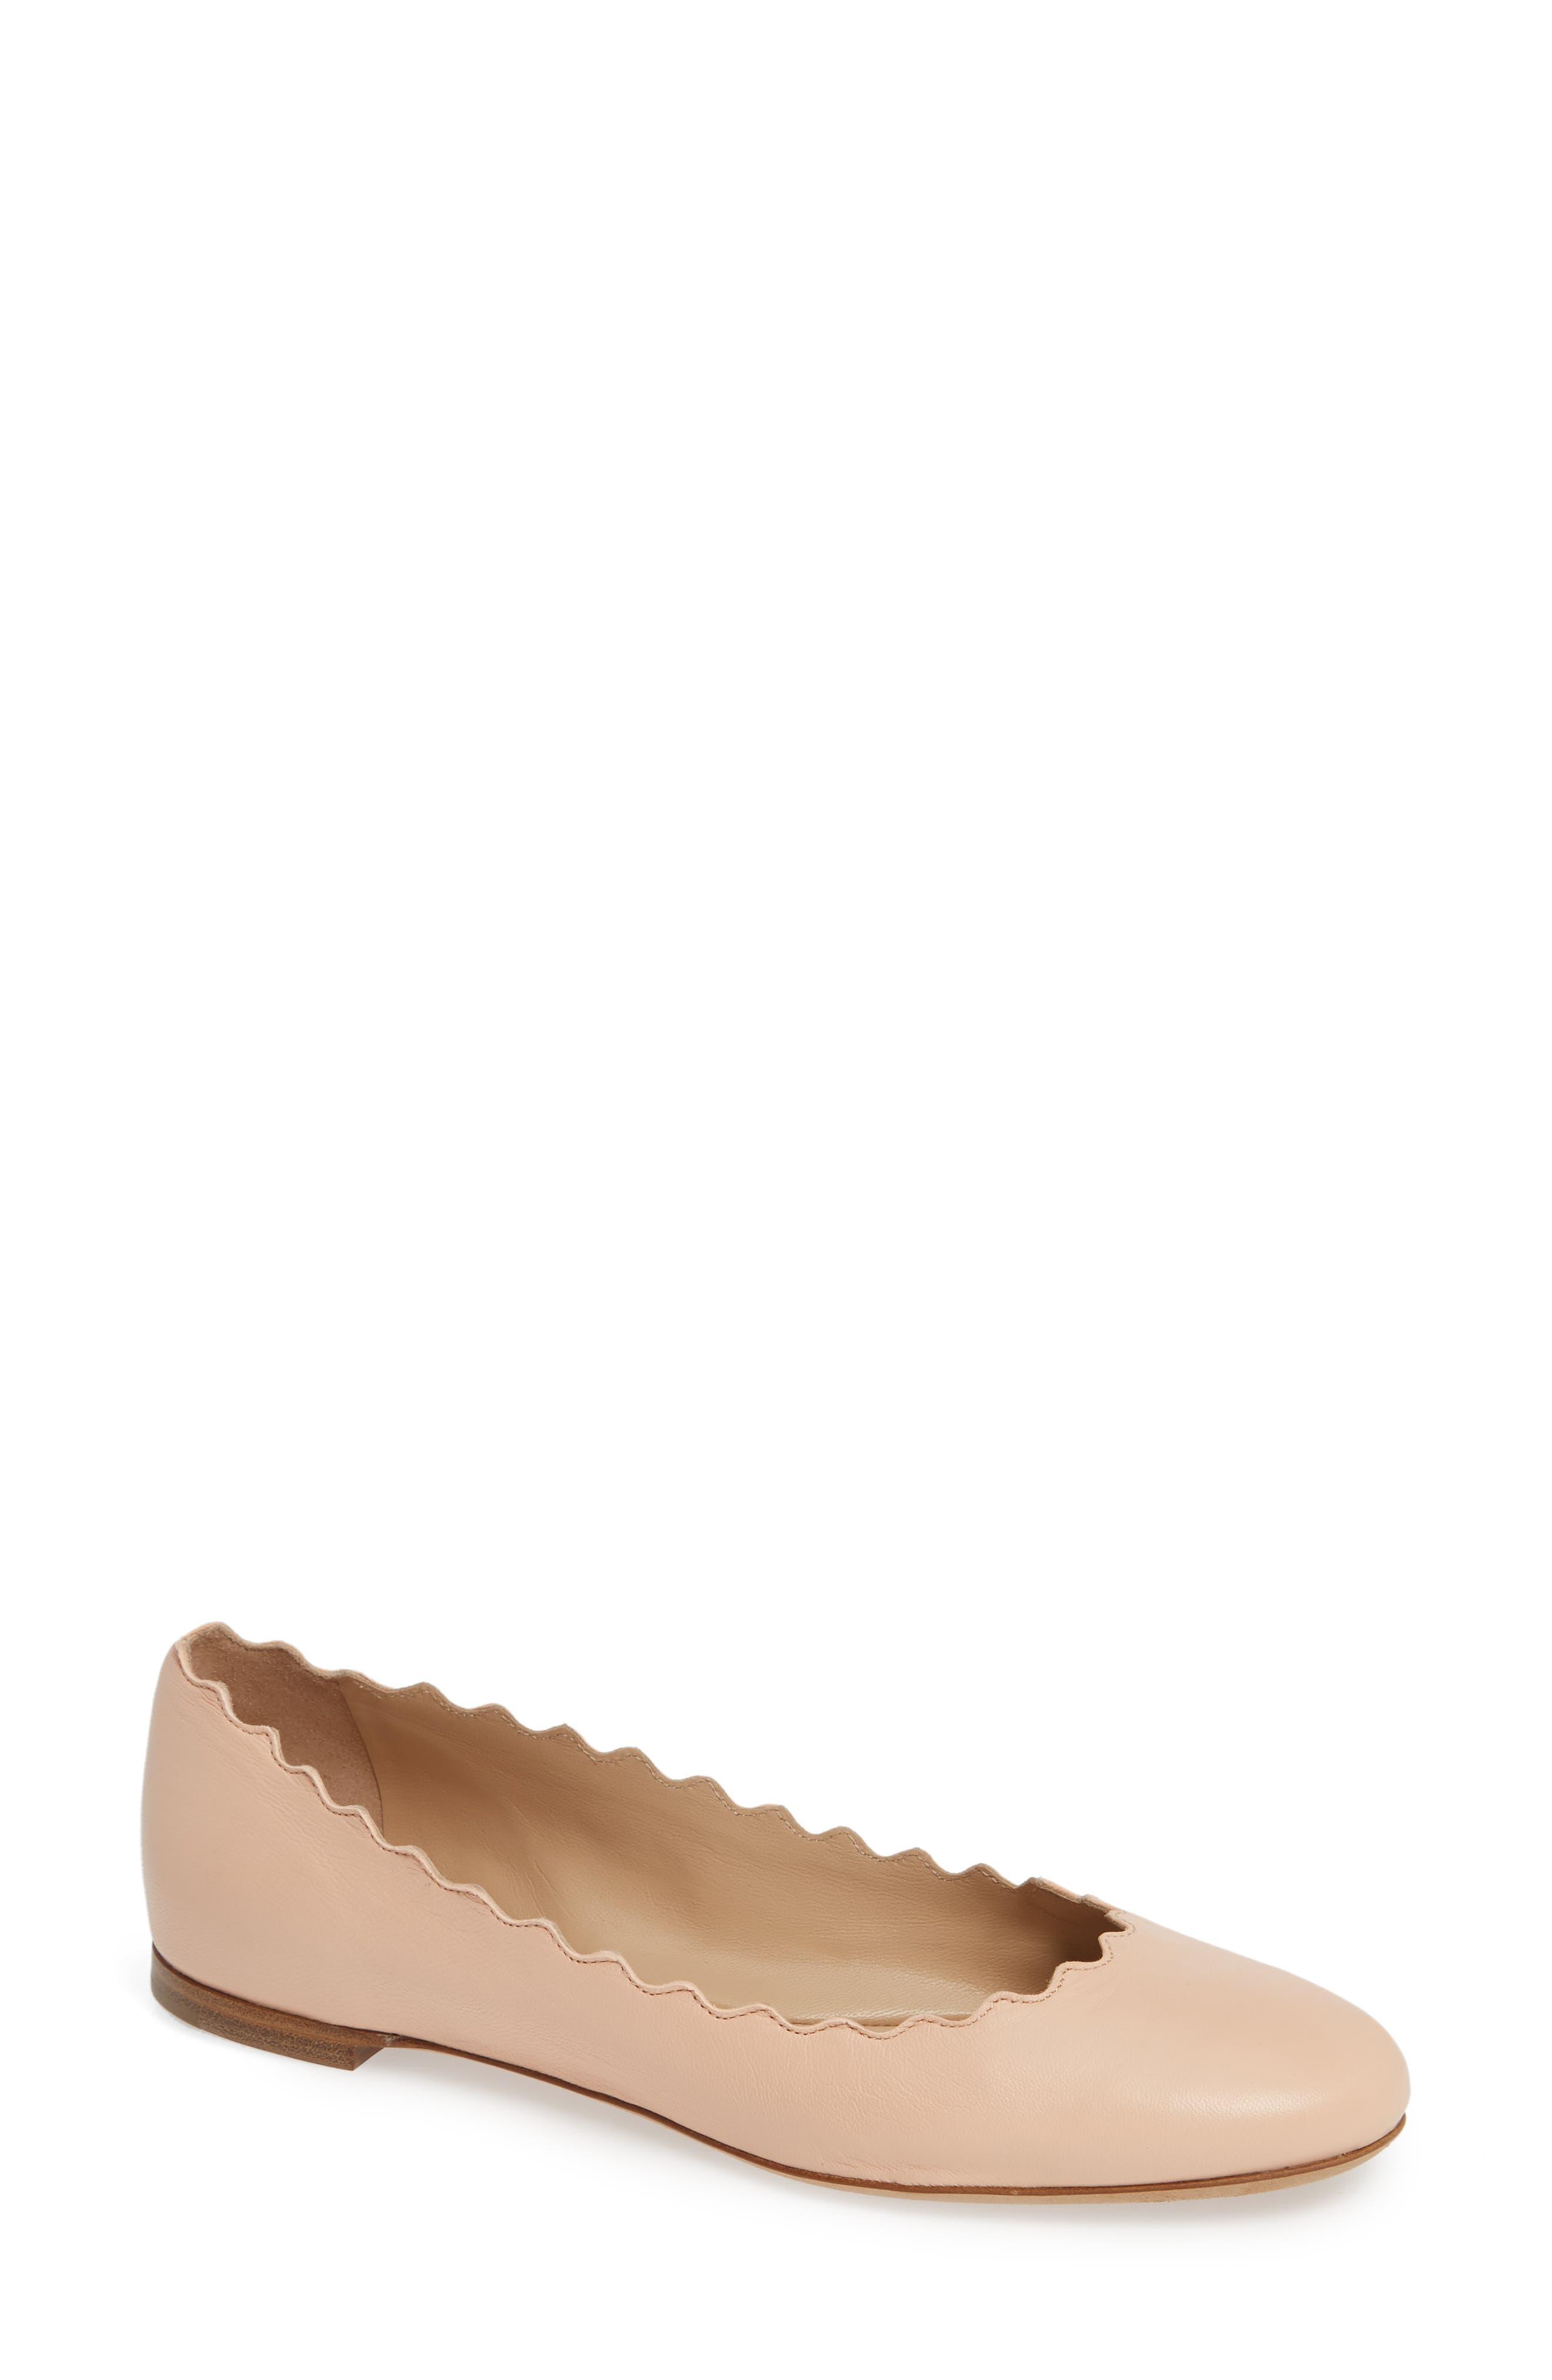 CHLOÉ, 'Lauren' Scalloped Ballet Flat, Main thumbnail 1, color, DELICATE PINK LEATHER